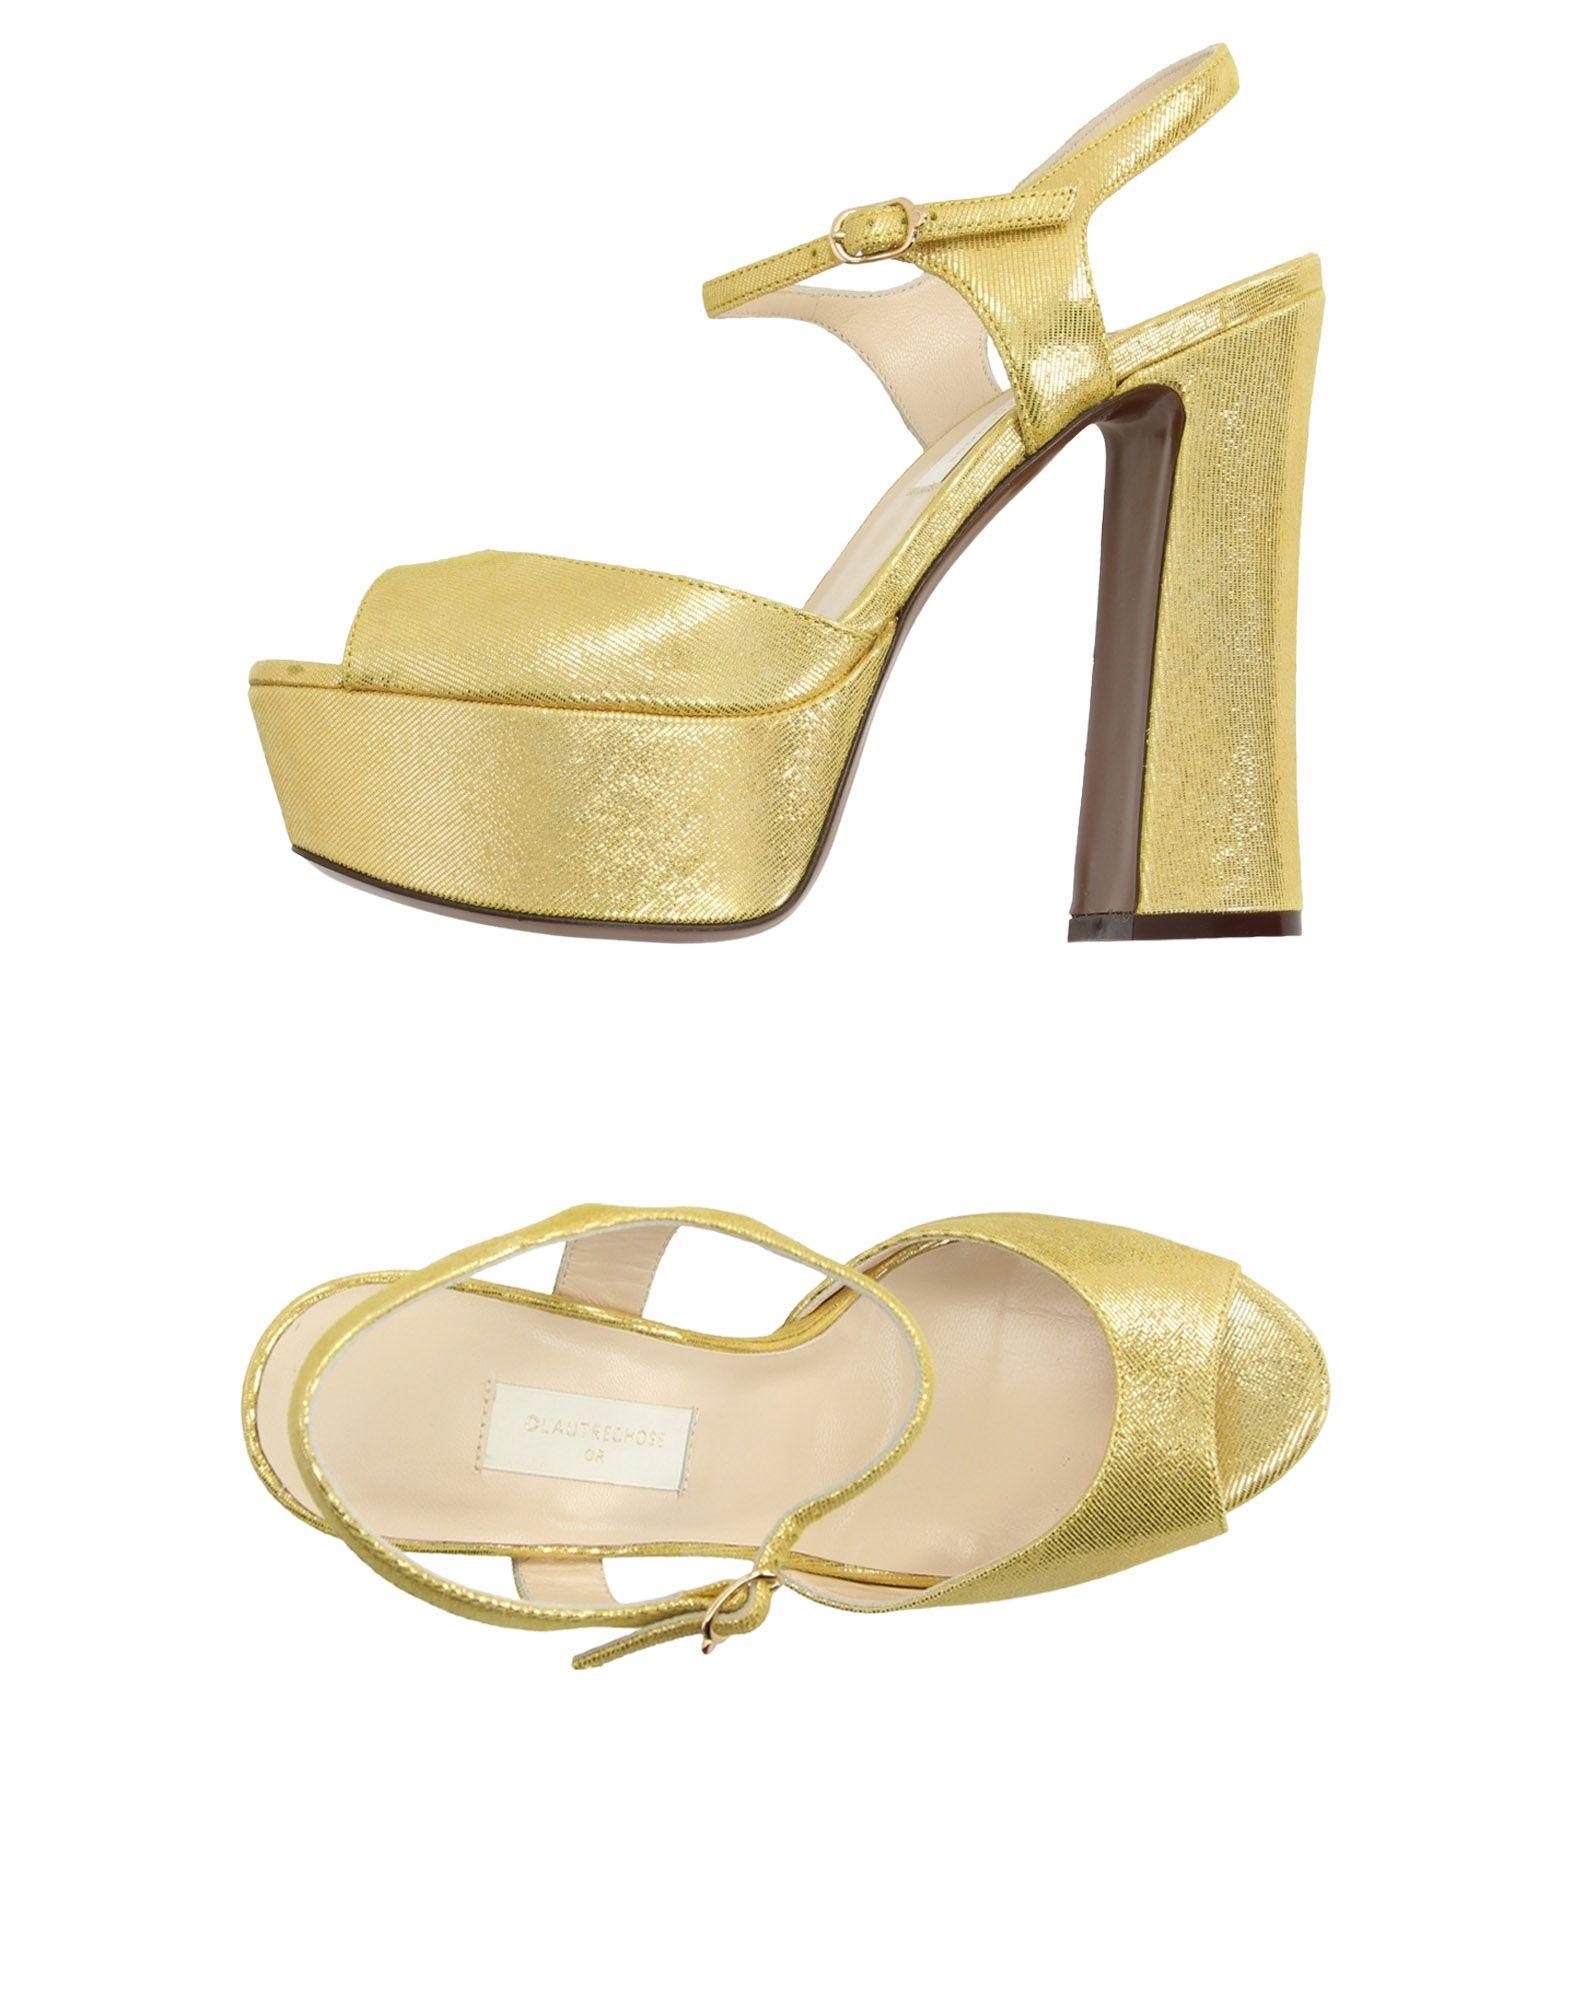 L' Autre Chose Sandalen Schuhe Damen  11180205LT Neue Schuhe Sandalen 2779ae